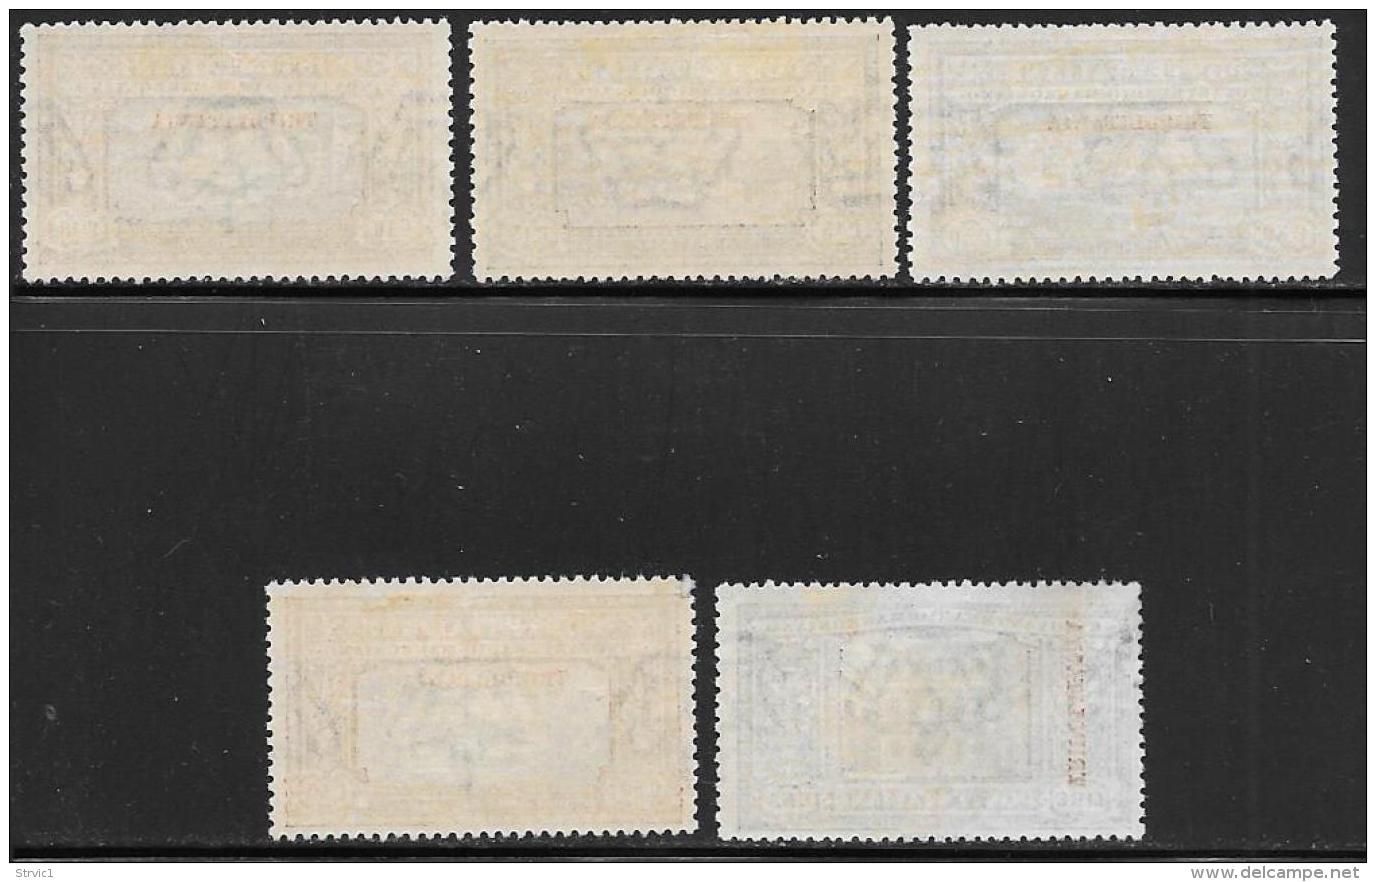 Tripolitania, Scott # 11-6 Mint Hinged Italy Manzoni Issue Overprinted, 1924, #16 Has Gum Disturbance On Left Side, - Tripolitania